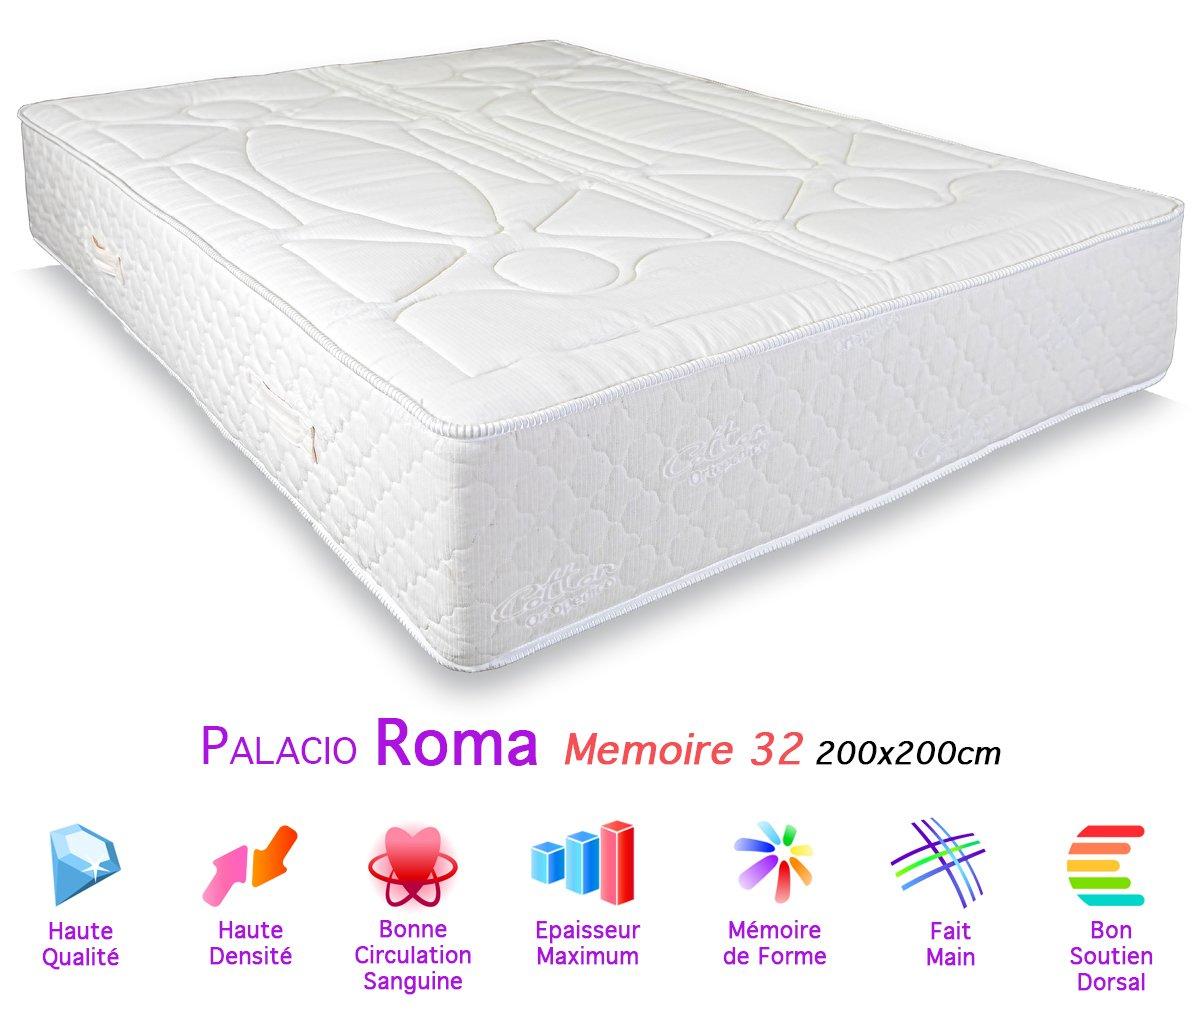 Palacio Roma Matratze Memory Foam 32, 200 x 200 cm günstig online kaufen